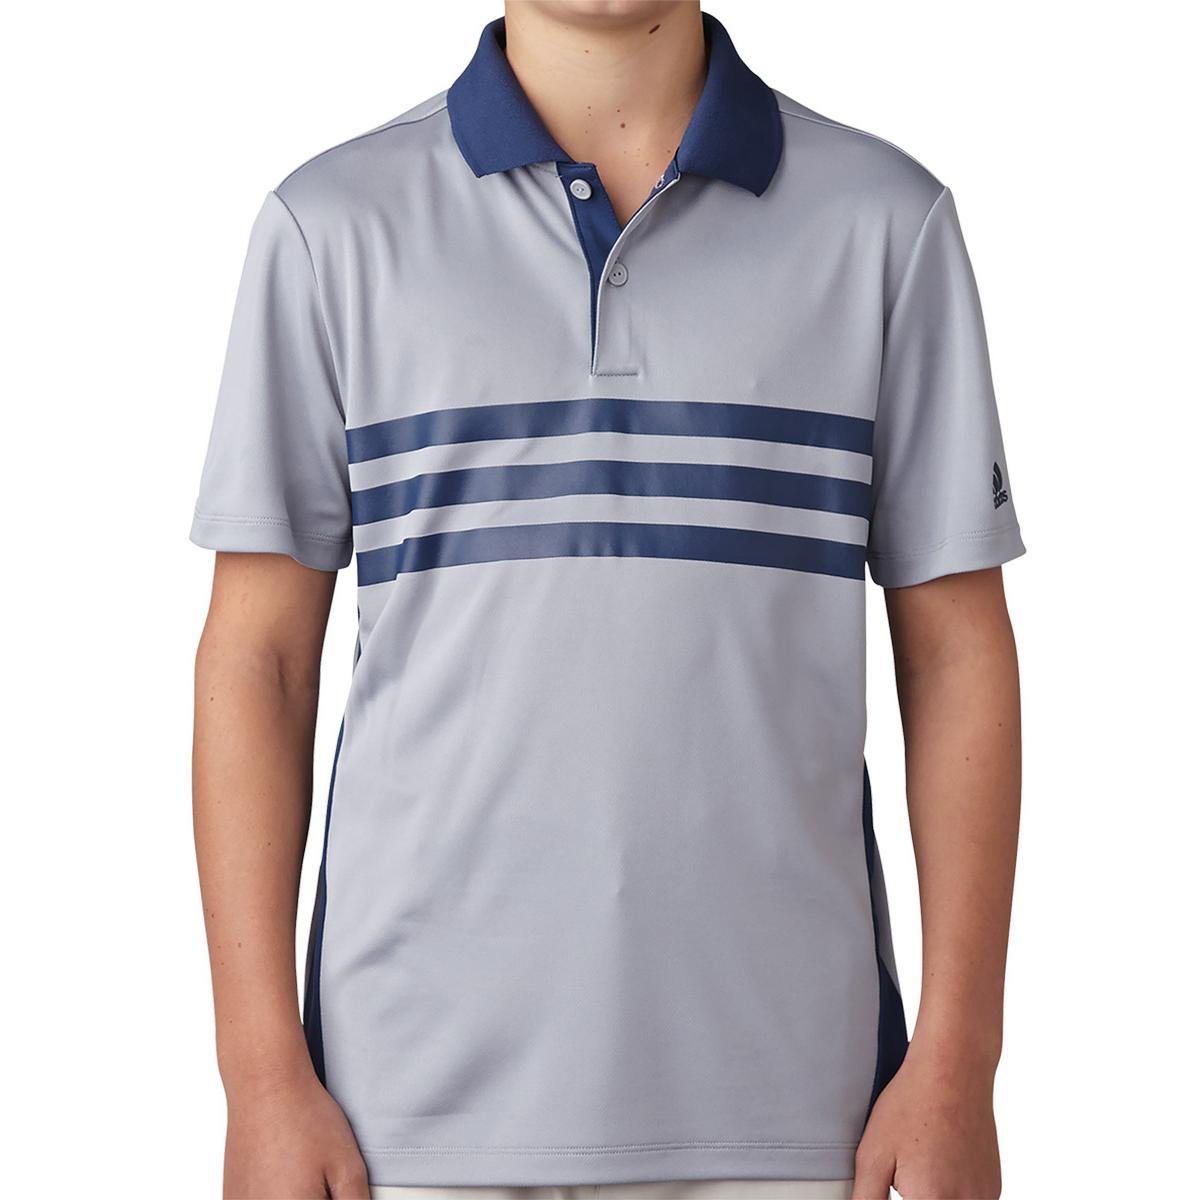 226b7892f Adidas 2019 England Cricket Replica Mens Polo Shirt - Nils Stucki ...